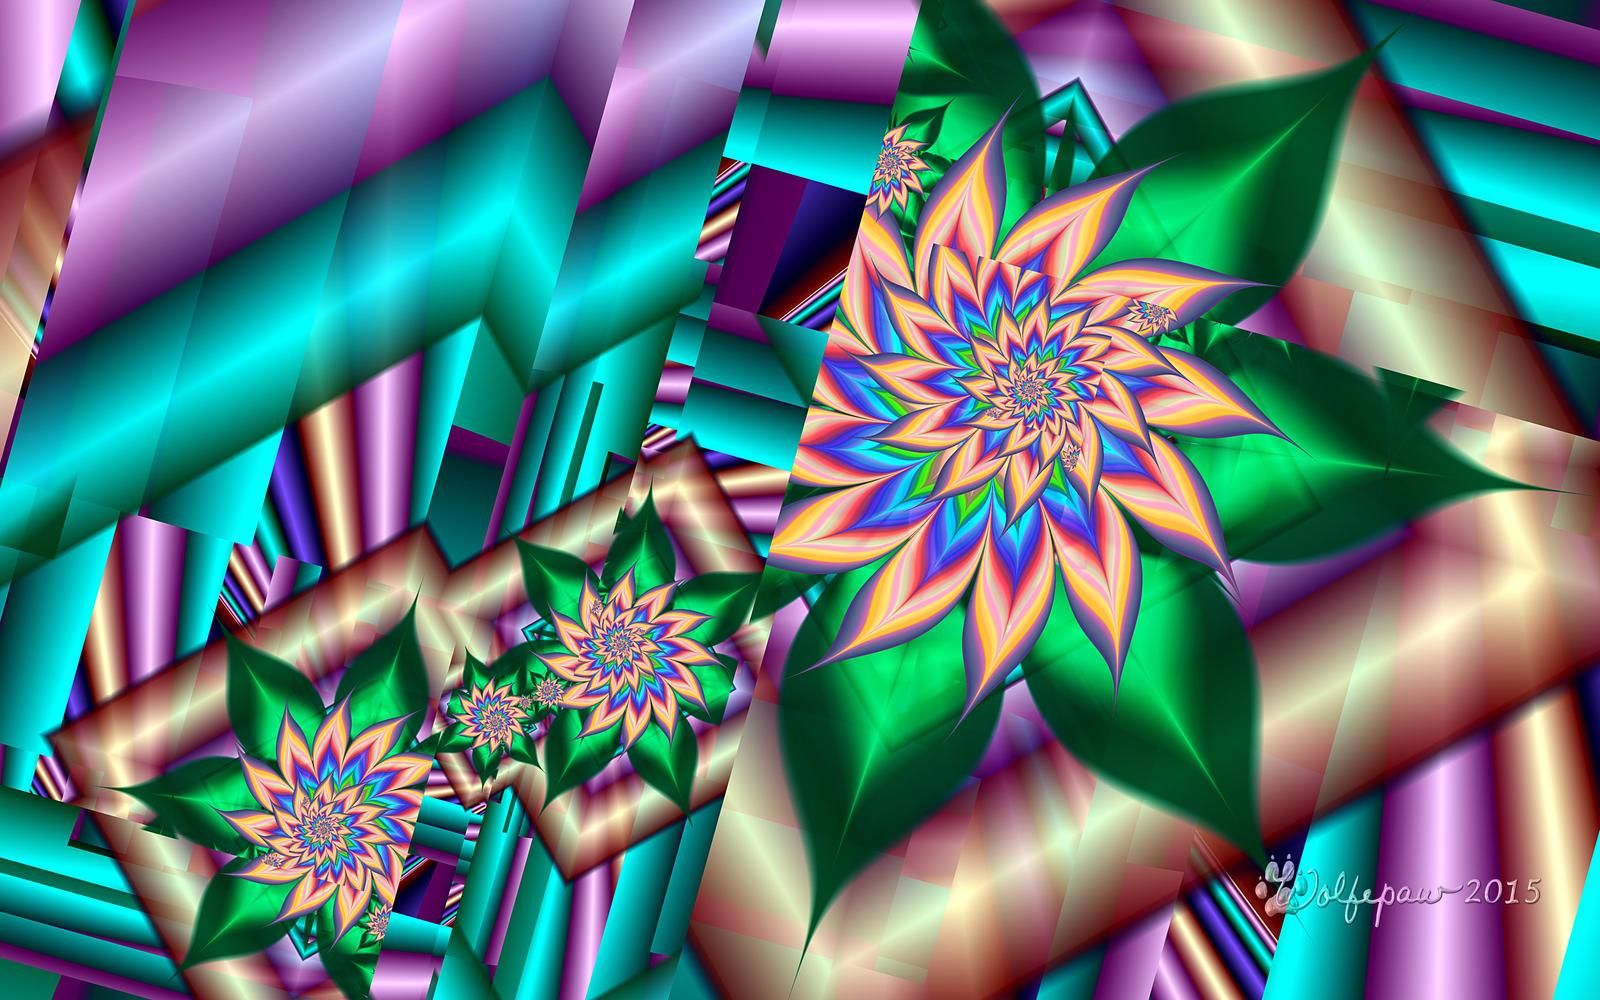 Barnsley Framed Flowers By Wolfepaw On DeviantArt